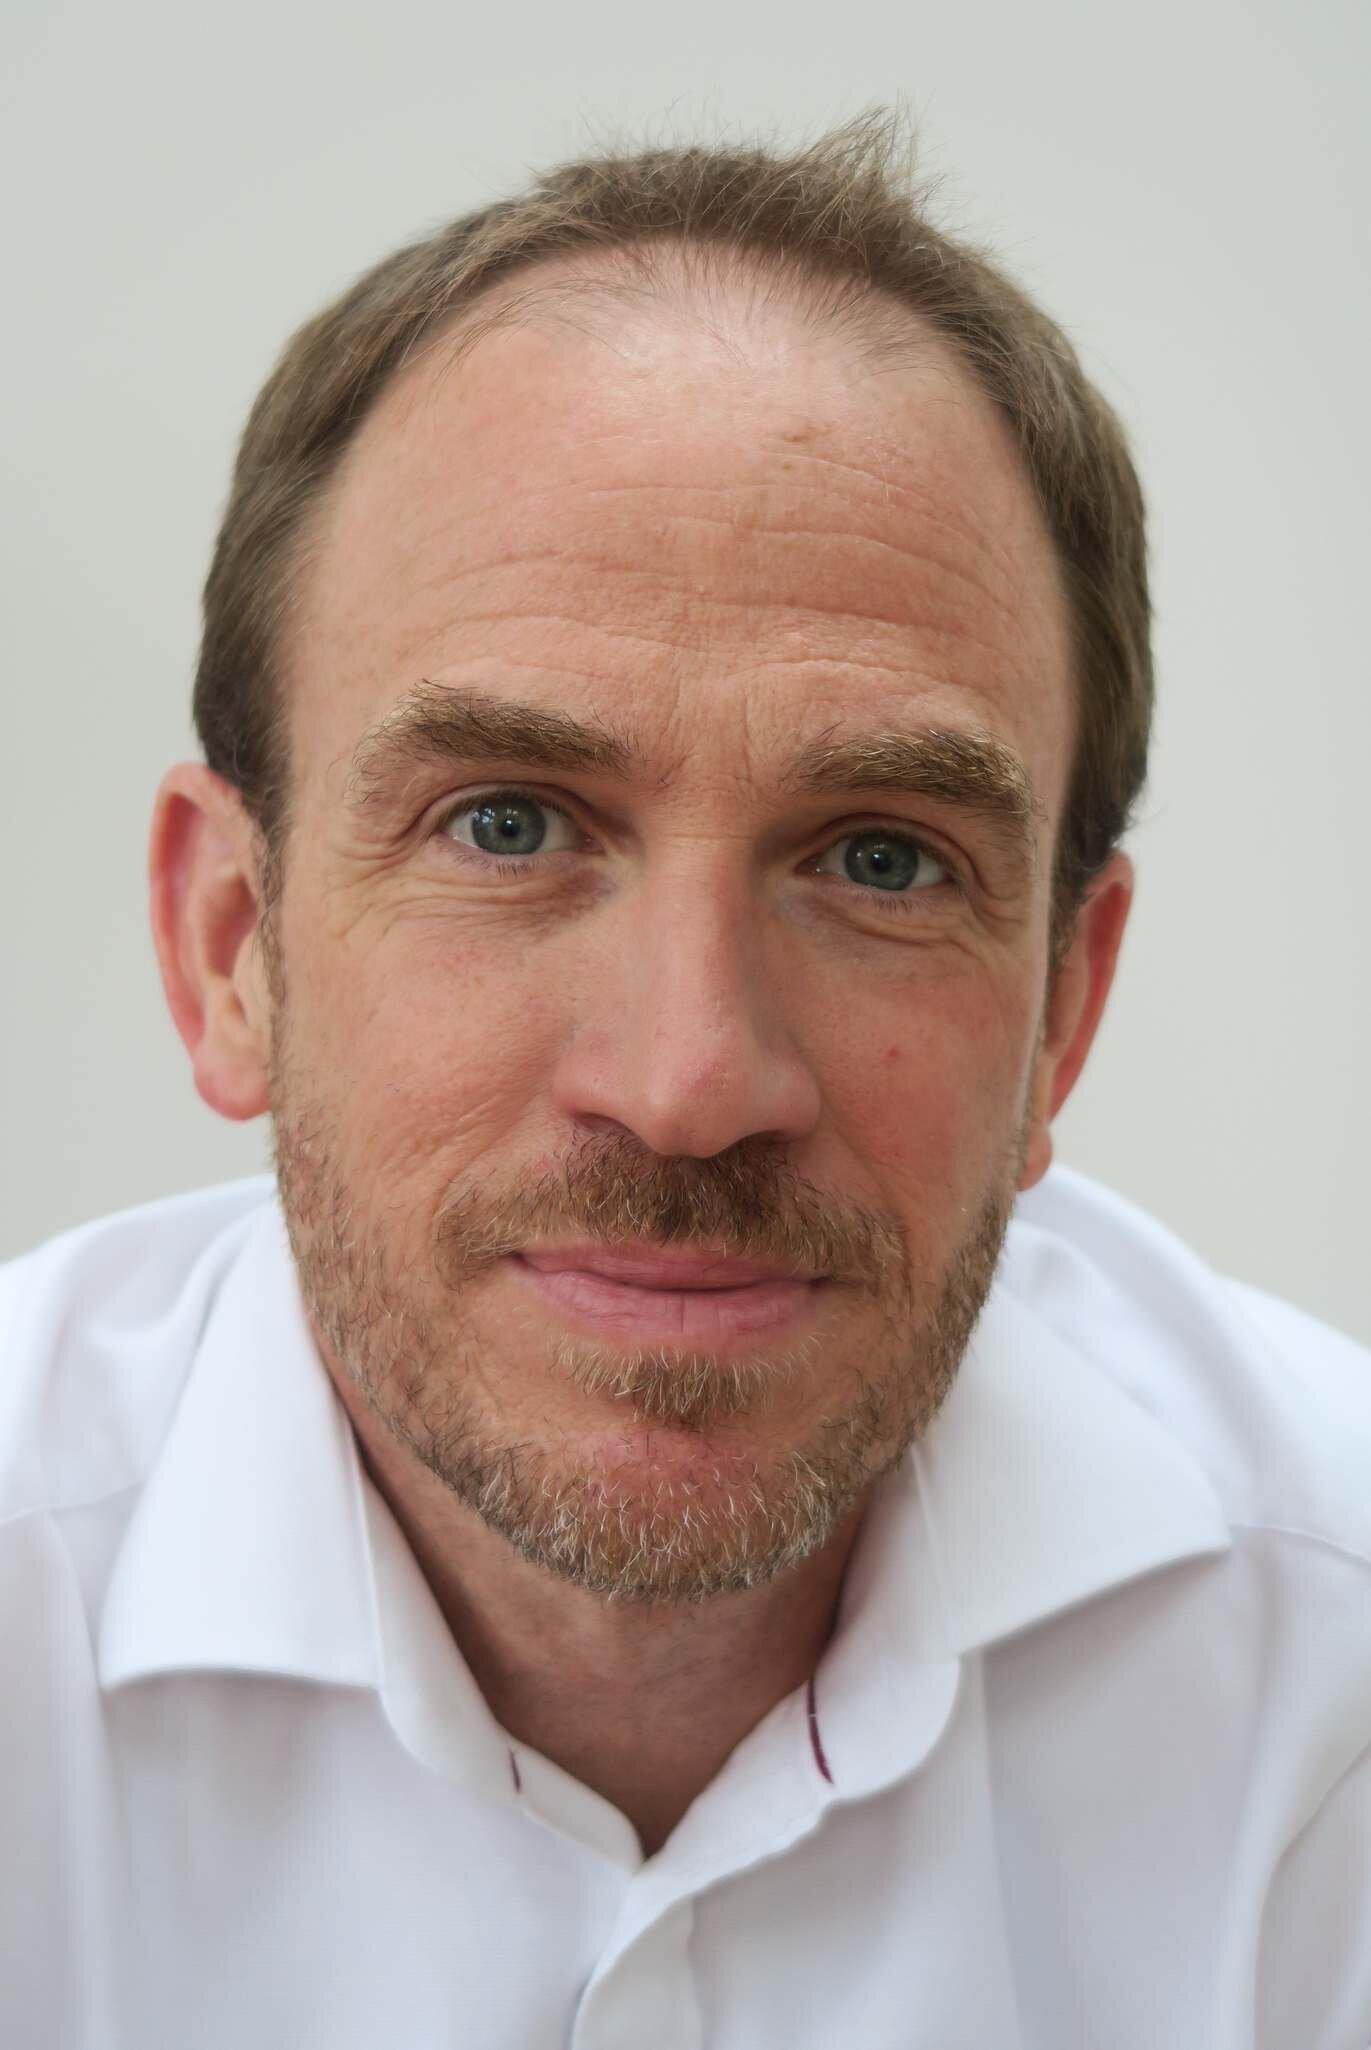 Rob Ferris CEO of Konica Minolta UK